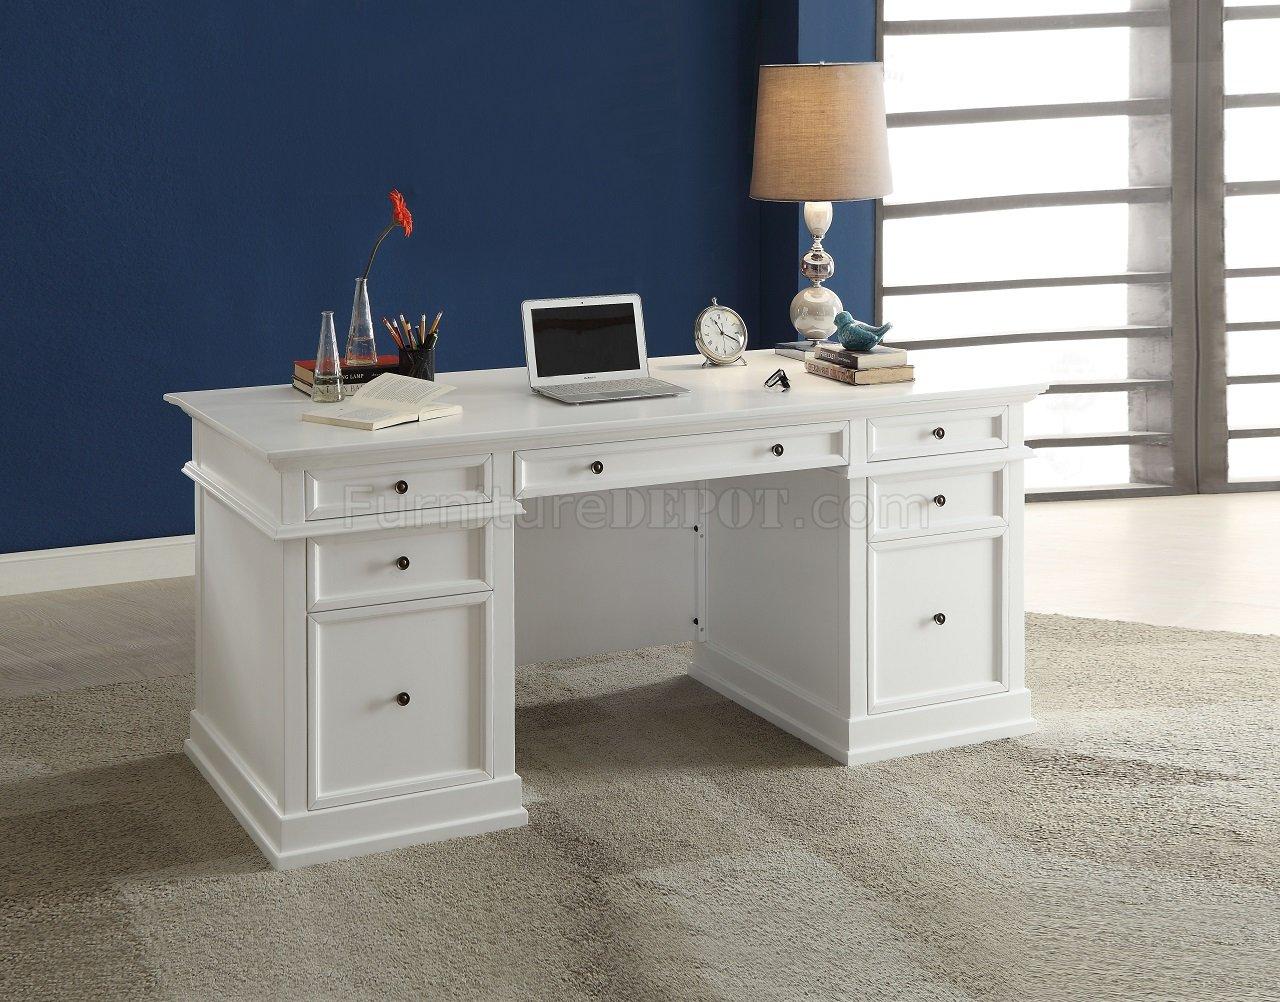 Daiki 92255 Office Desk in White by Acme